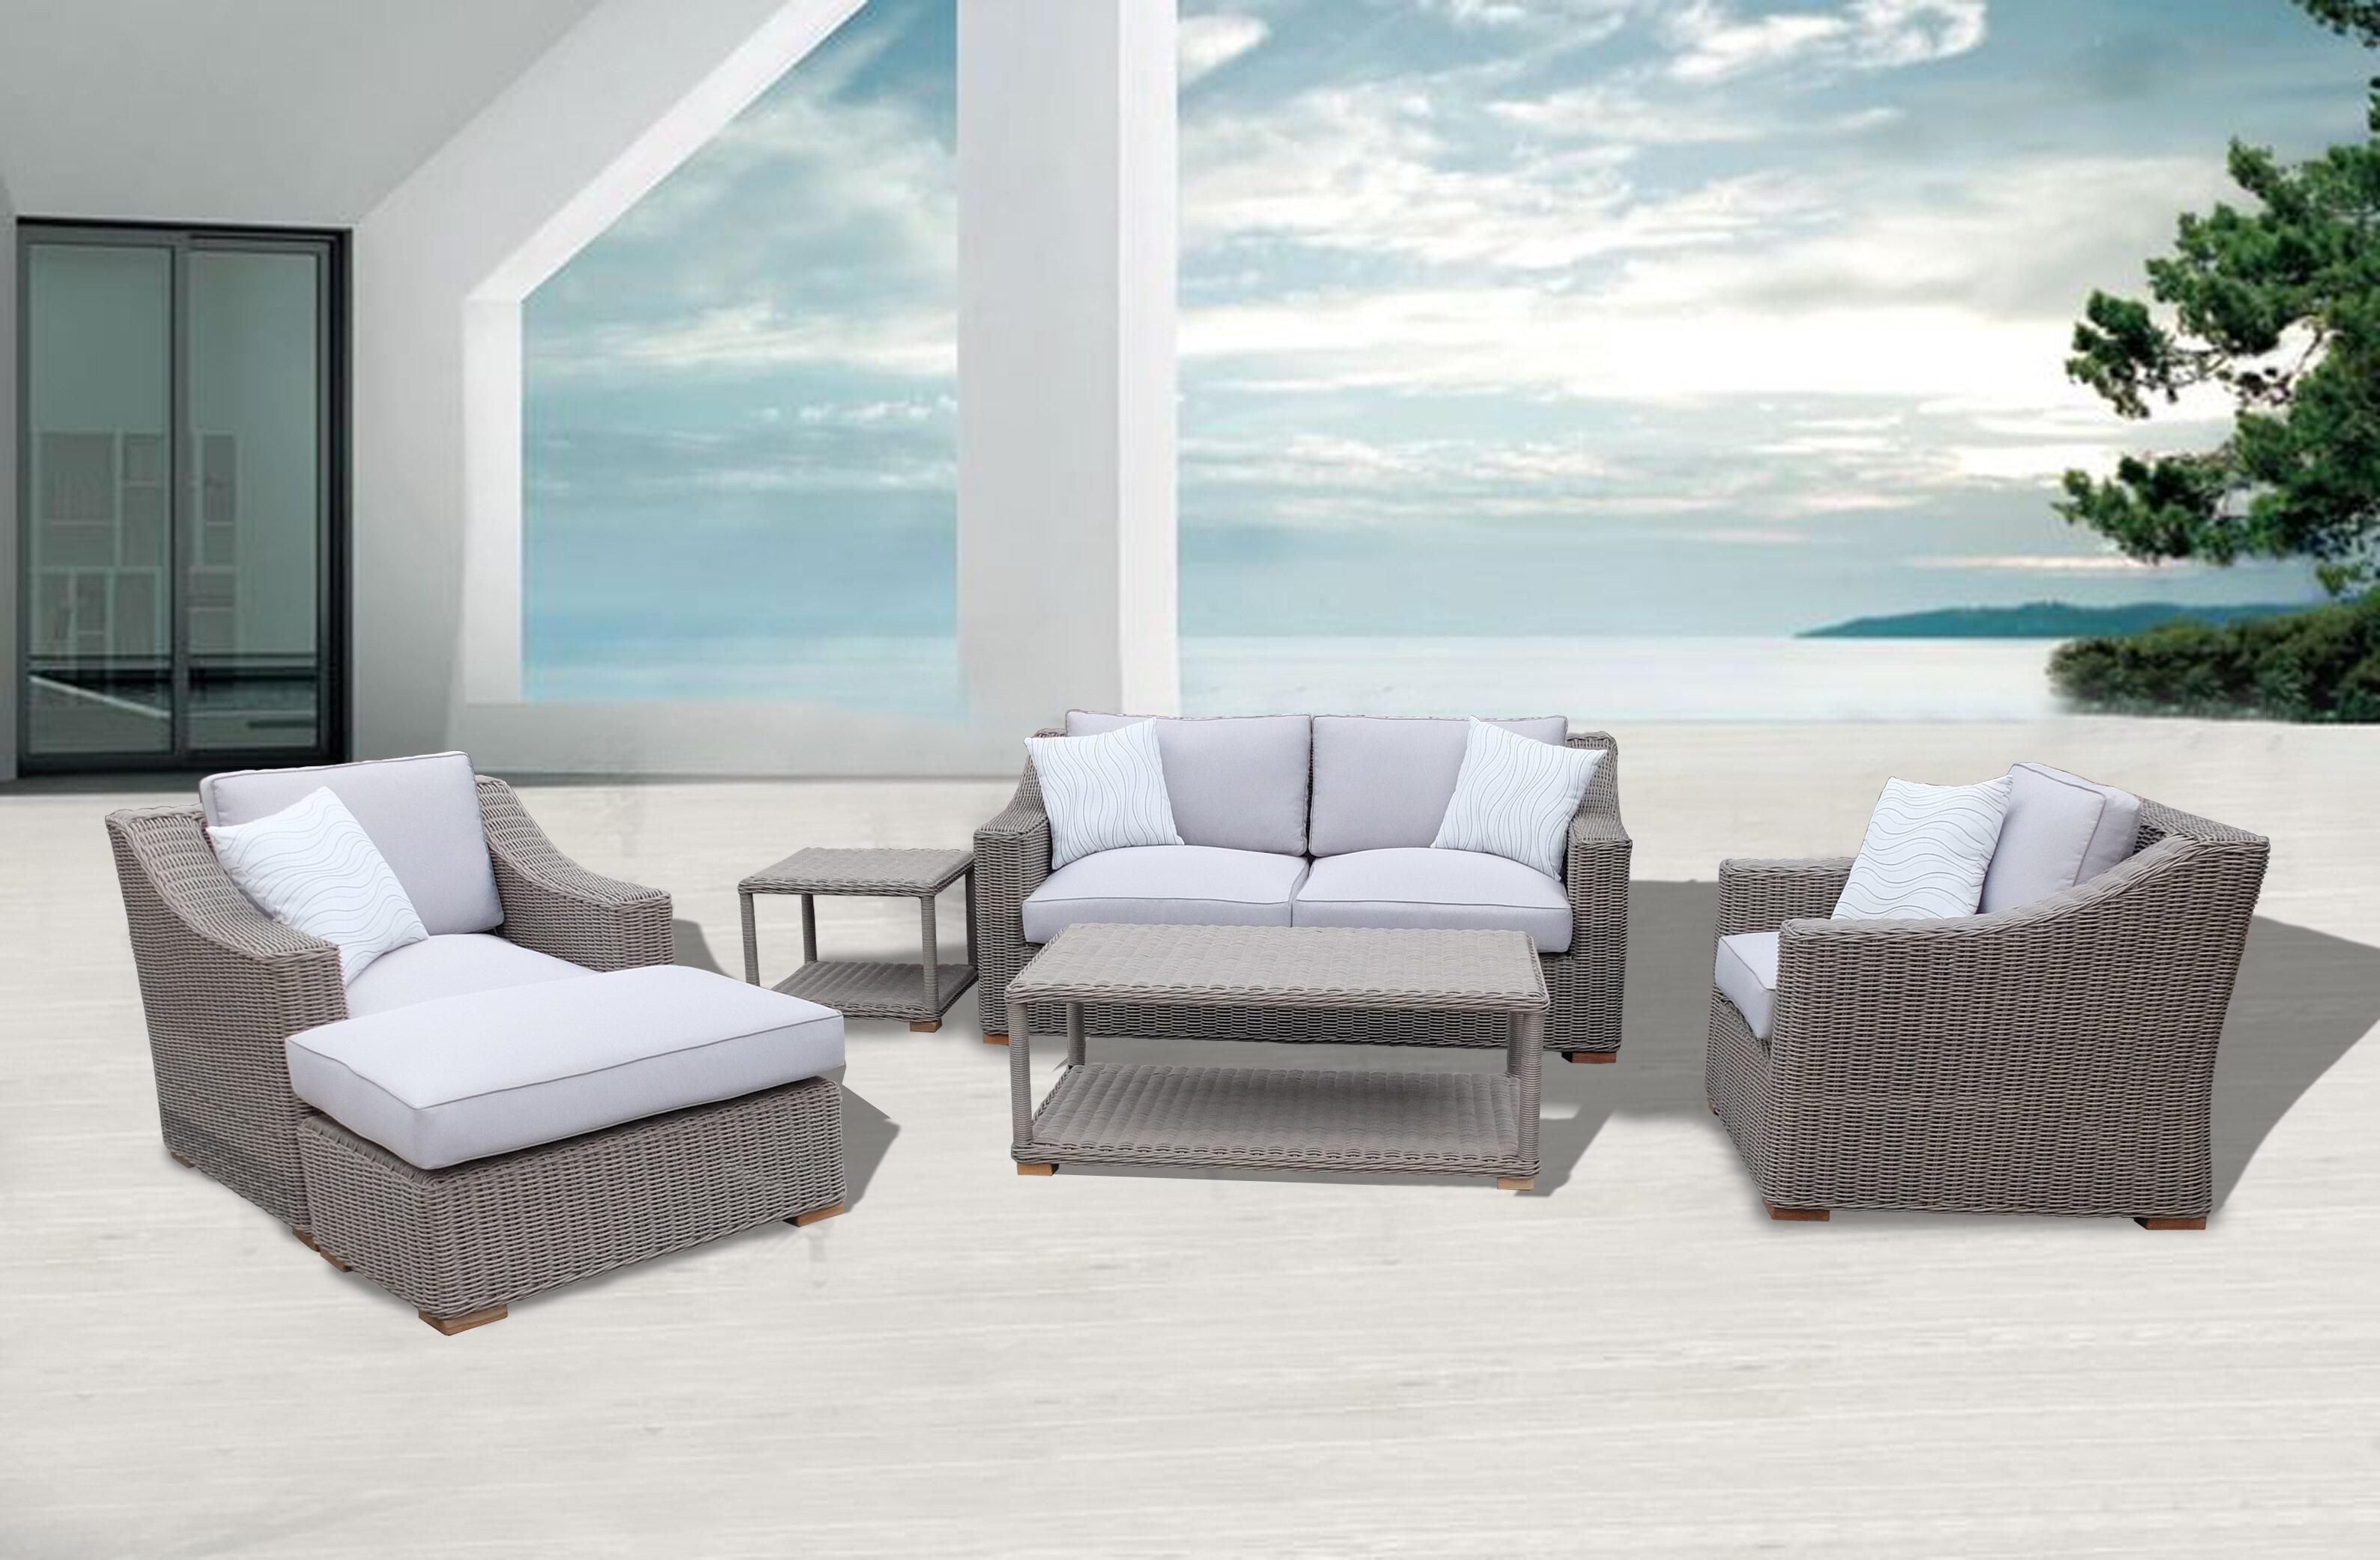 Highland Dunes Brokaw 6 Piece Sofa Set with Cushions | Wayfair